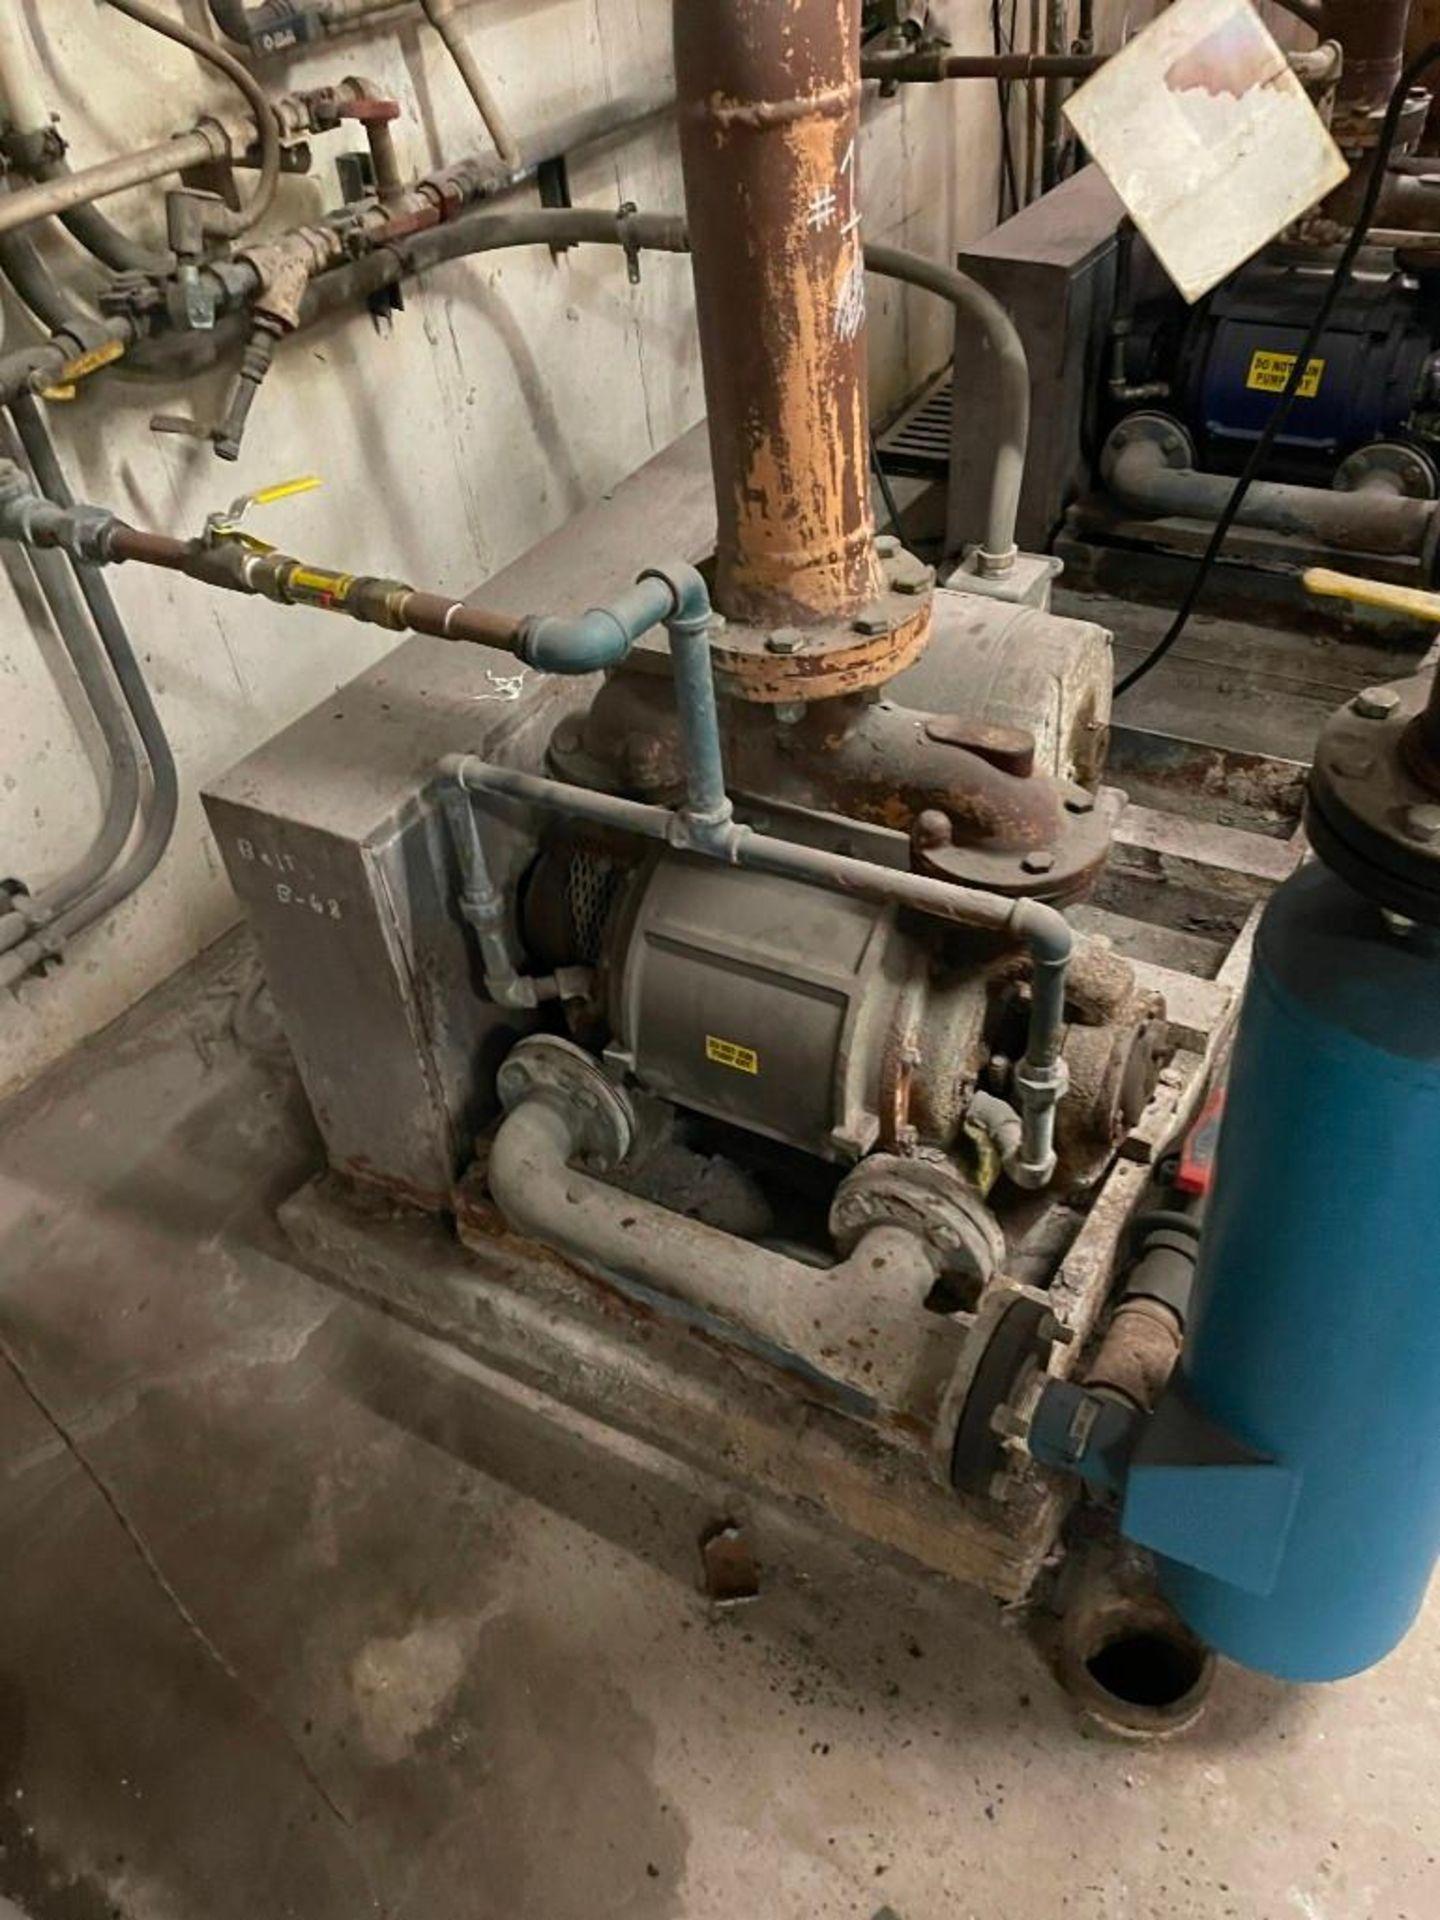 Nash CL-402 30 Horsepower Vacuum Pump - Image 2 of 6